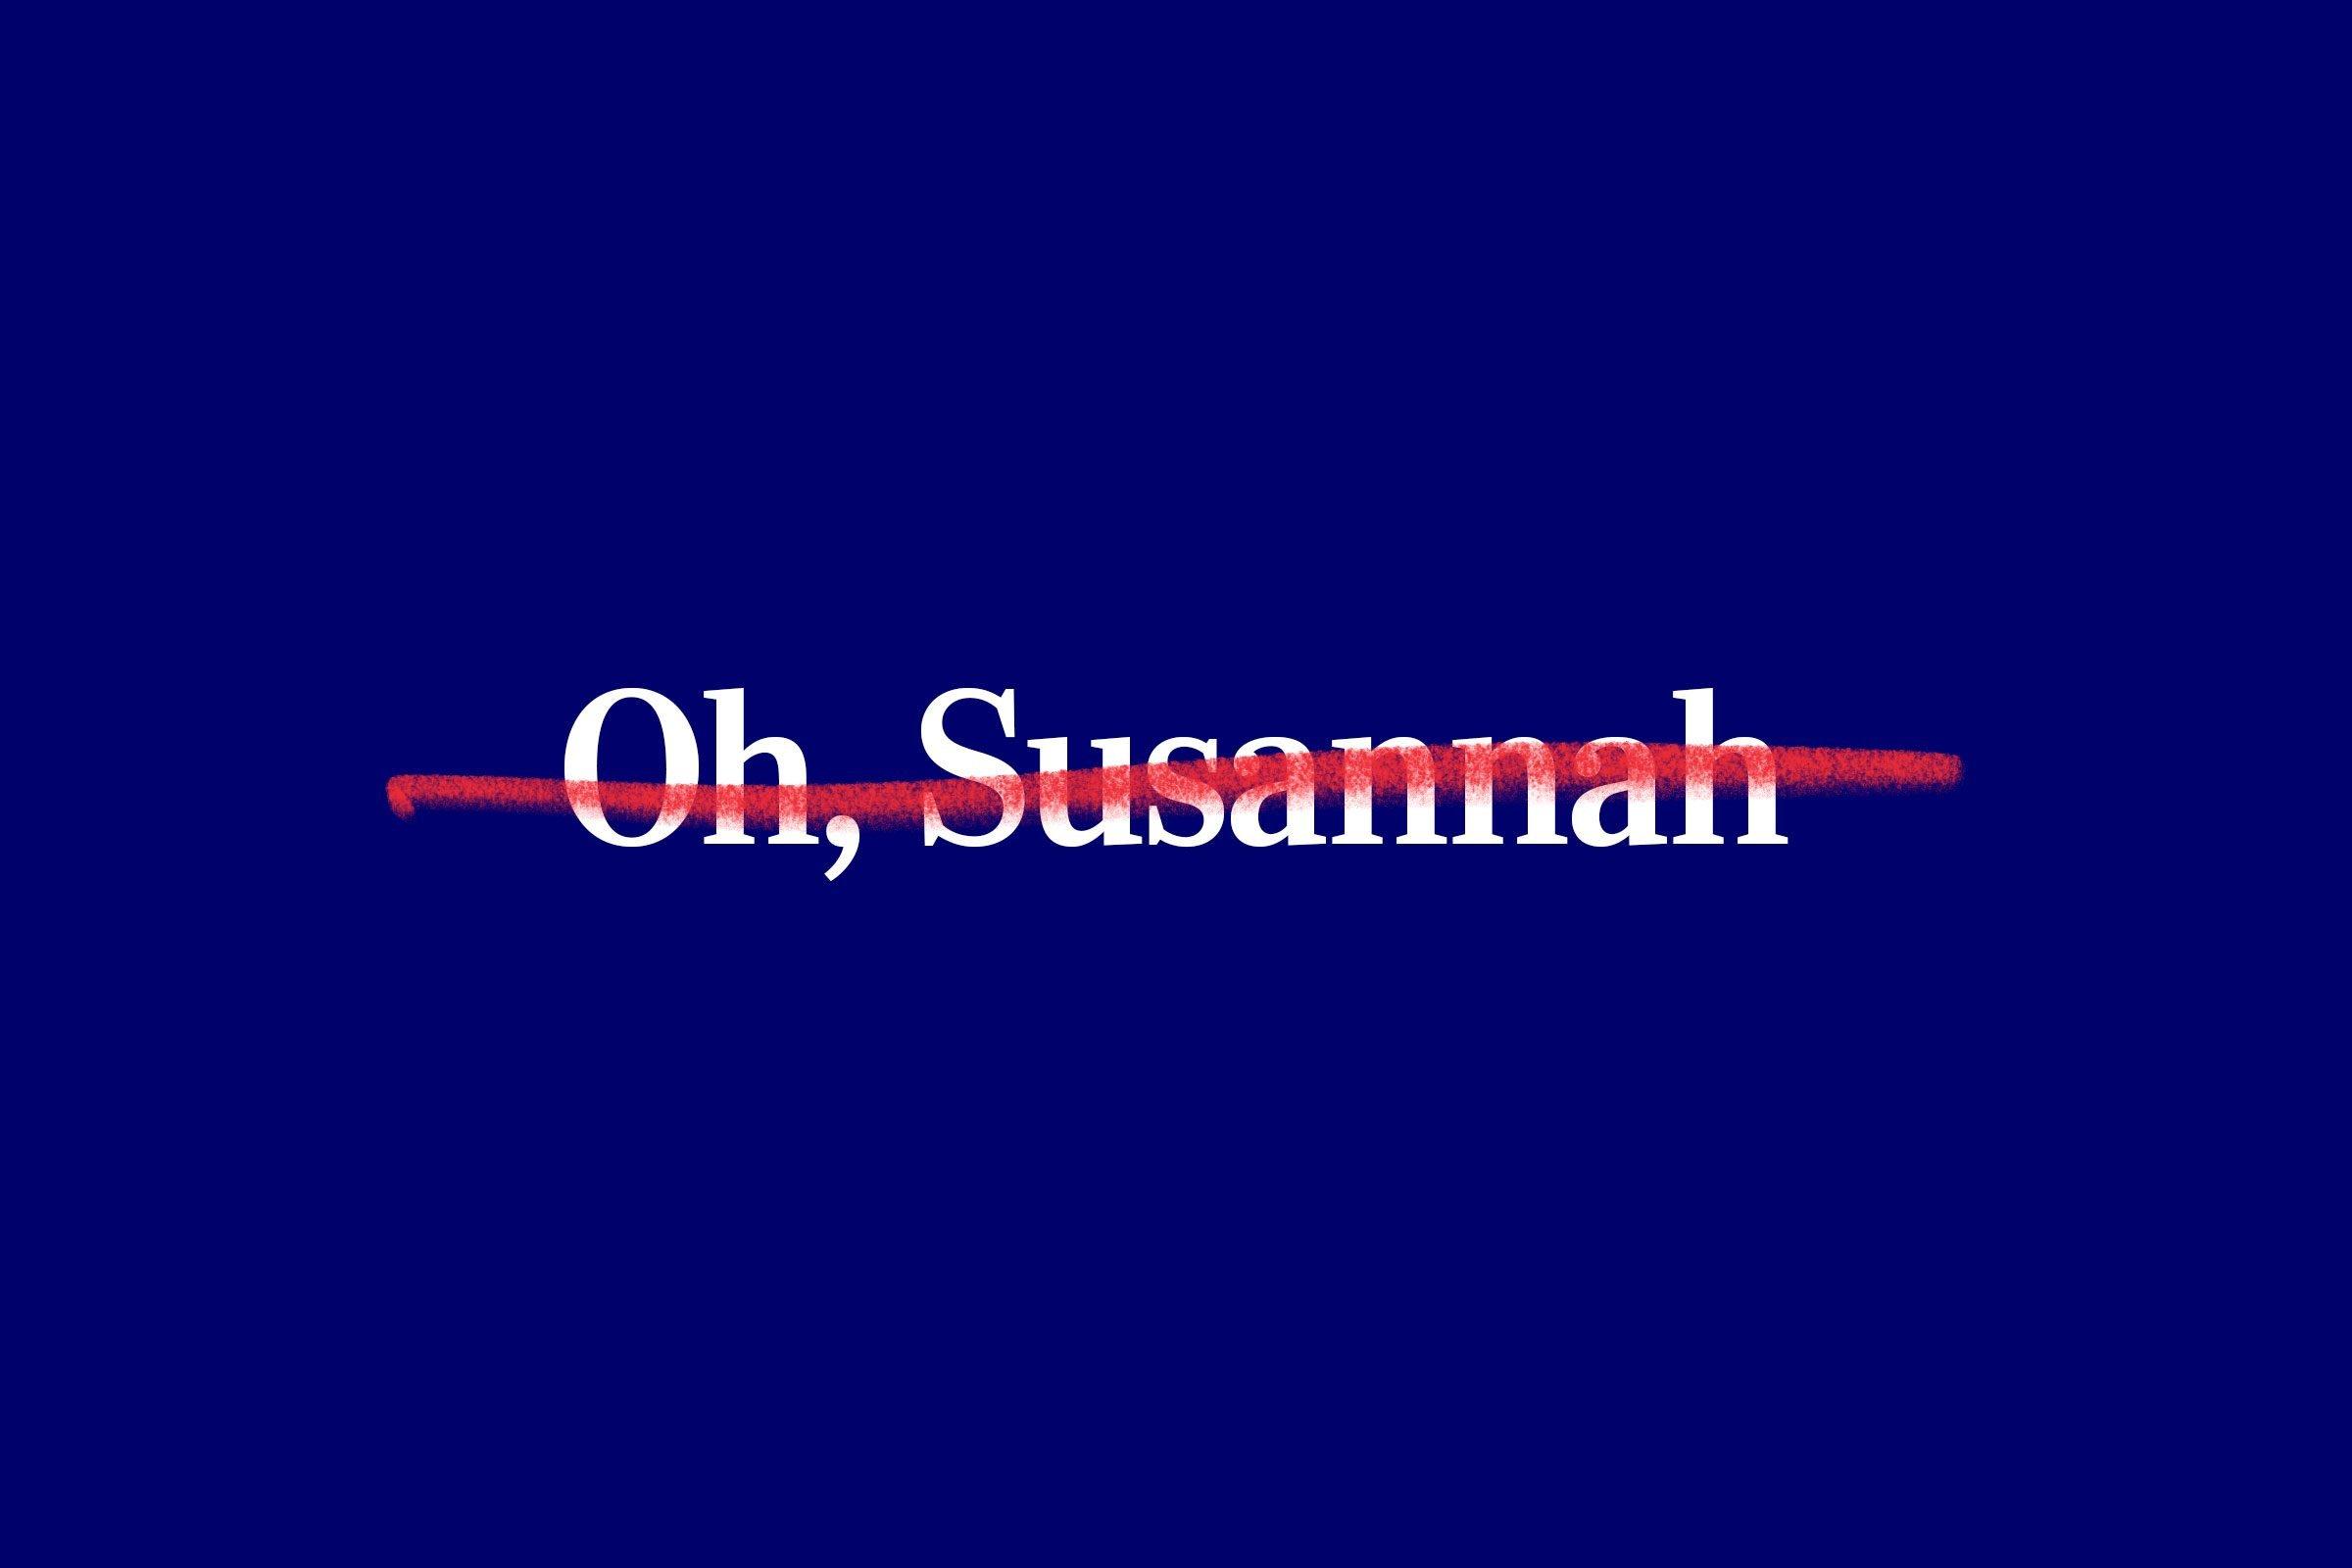 nursery rhyme title (Oh, Susannah) with red strikethrough overlay